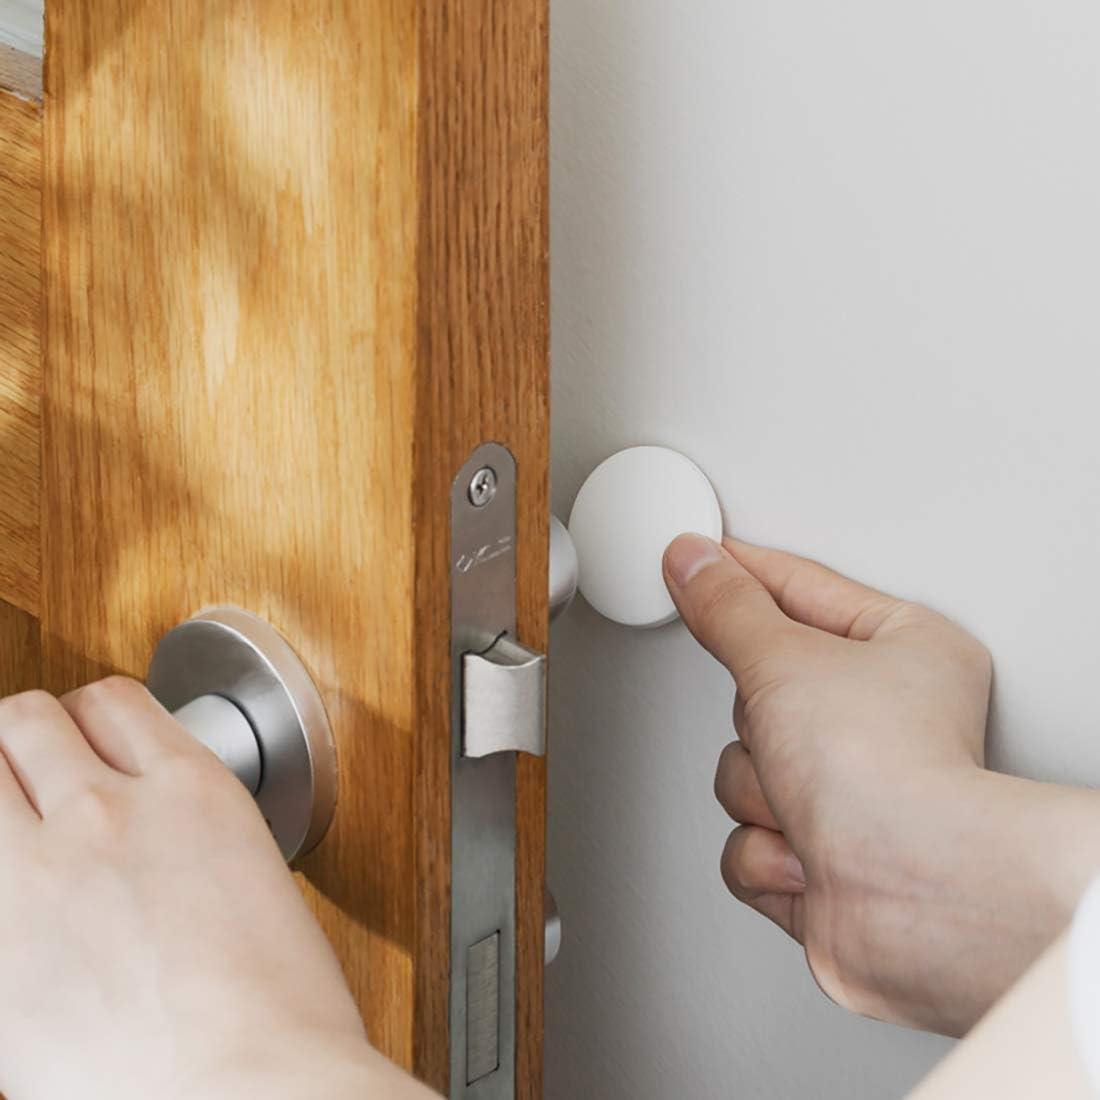 Cabinets etc. Silicone Wall Protector Door Stopper Wall Protector Door Knob Guard Refrigerator Door Wall Protectors with Self Adhesive for Protecting Wall Doorknobs 32 Pcs 1.57 Inch Door Bumper